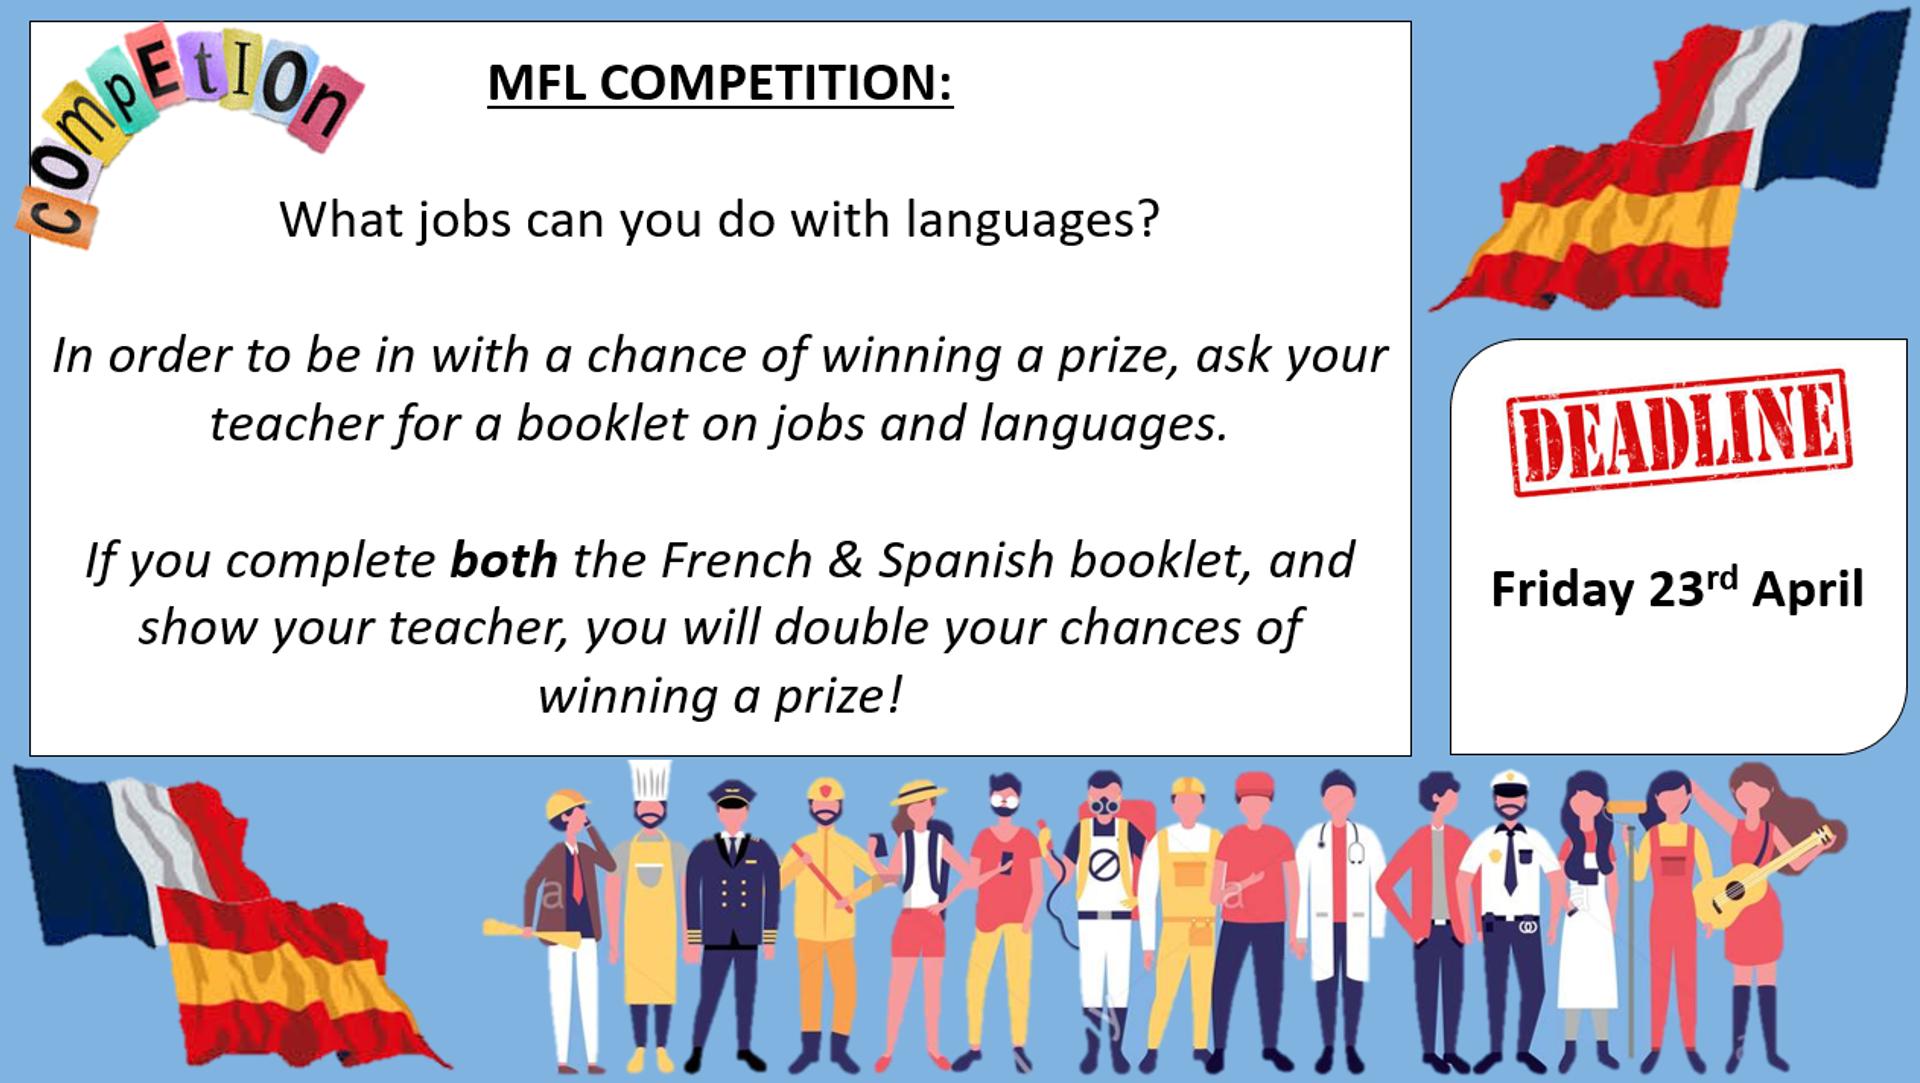 Lanuage Jobs Competition